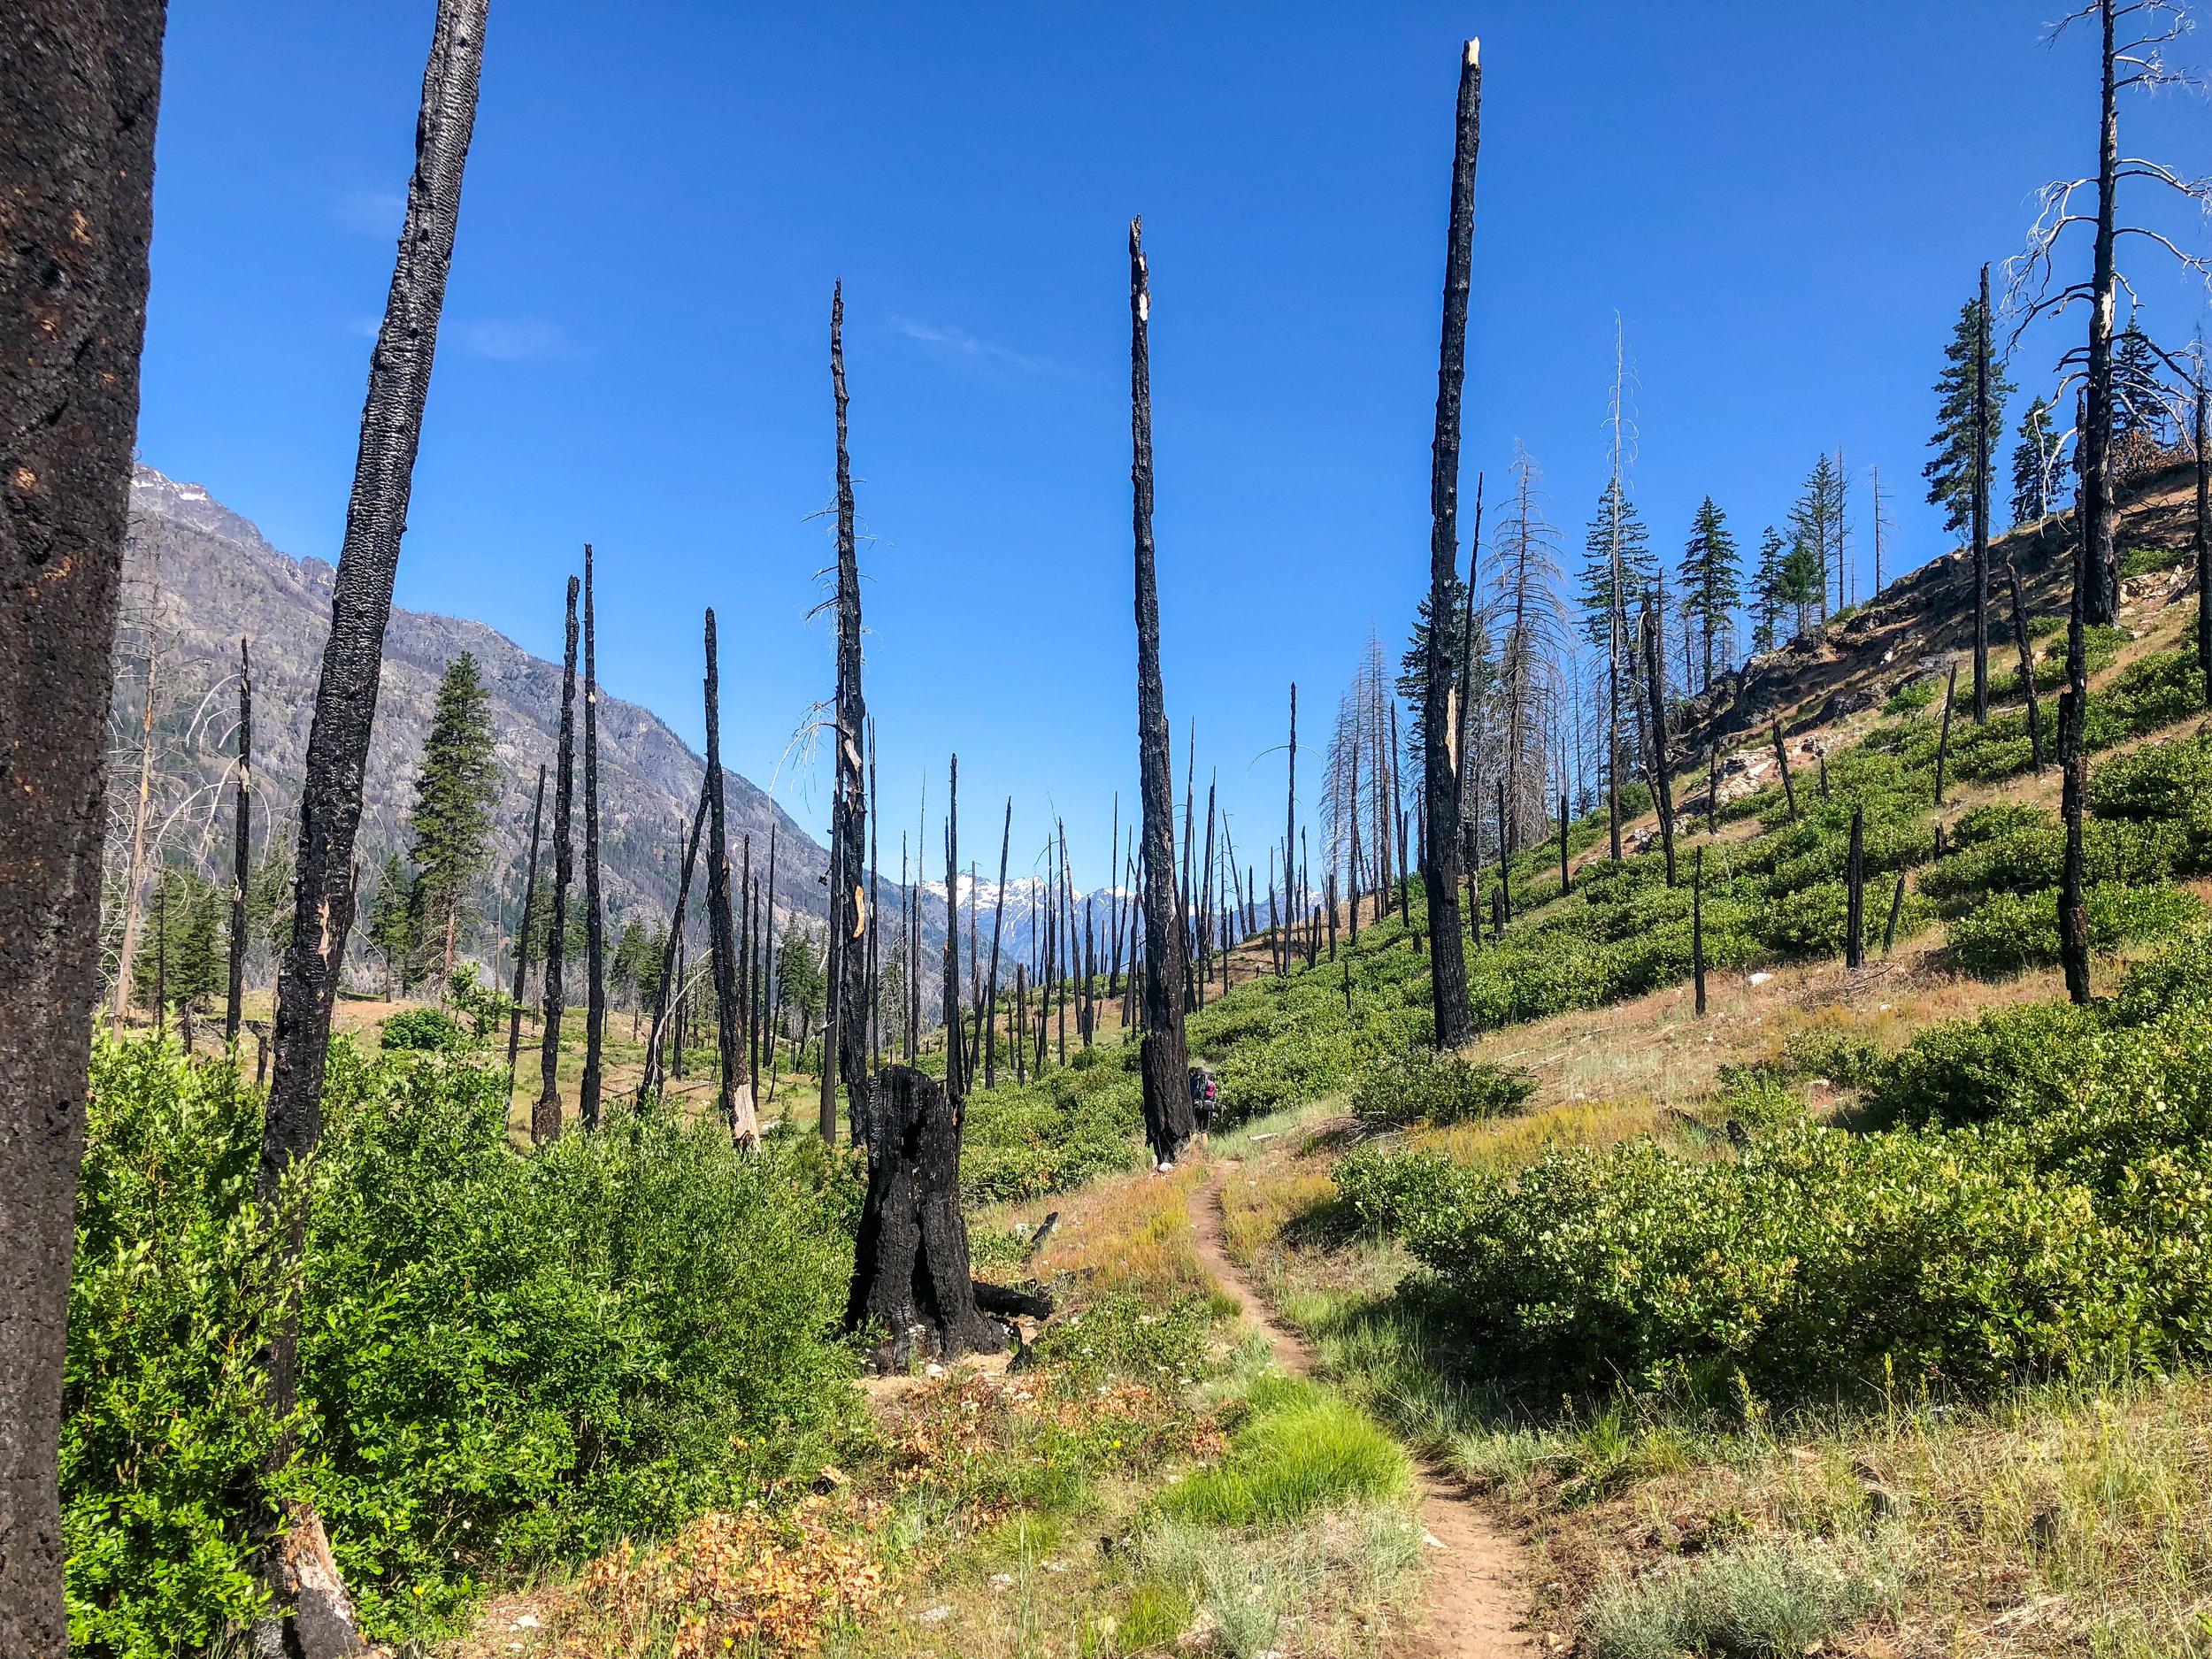 Hiking through burned areas